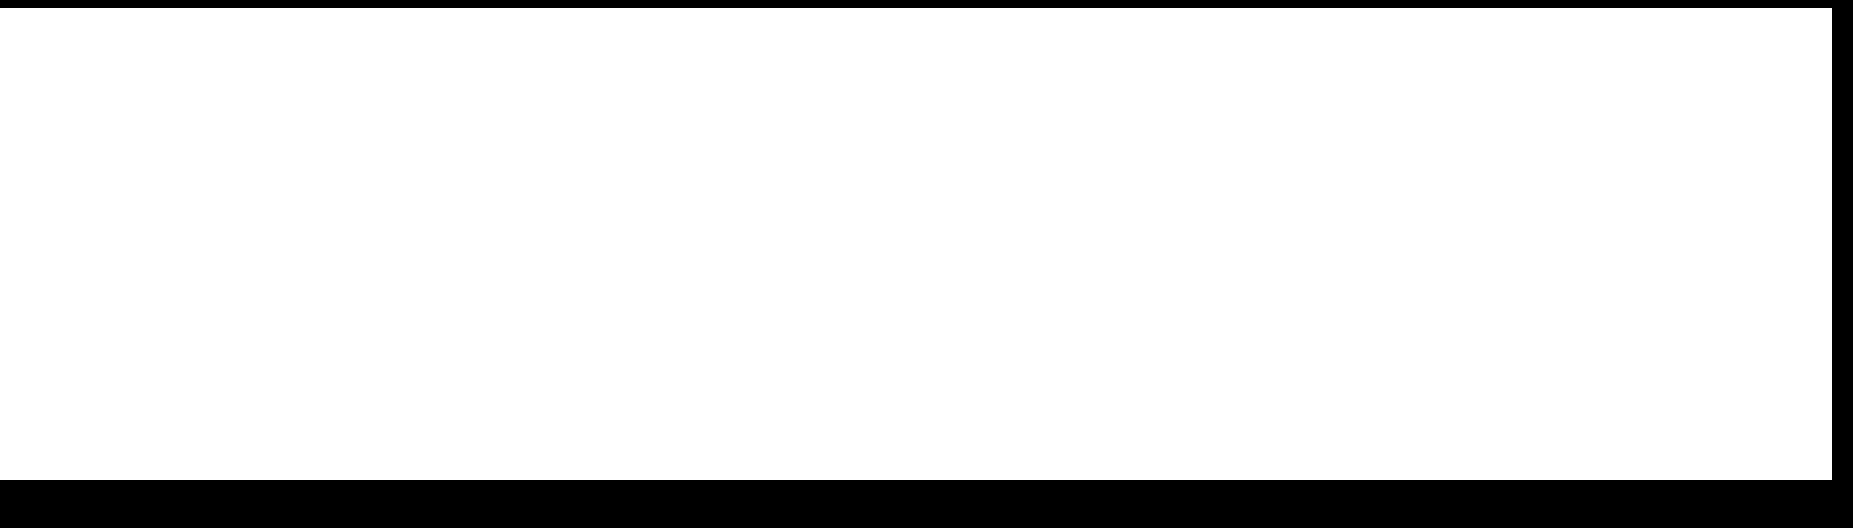 ScaleUpU white